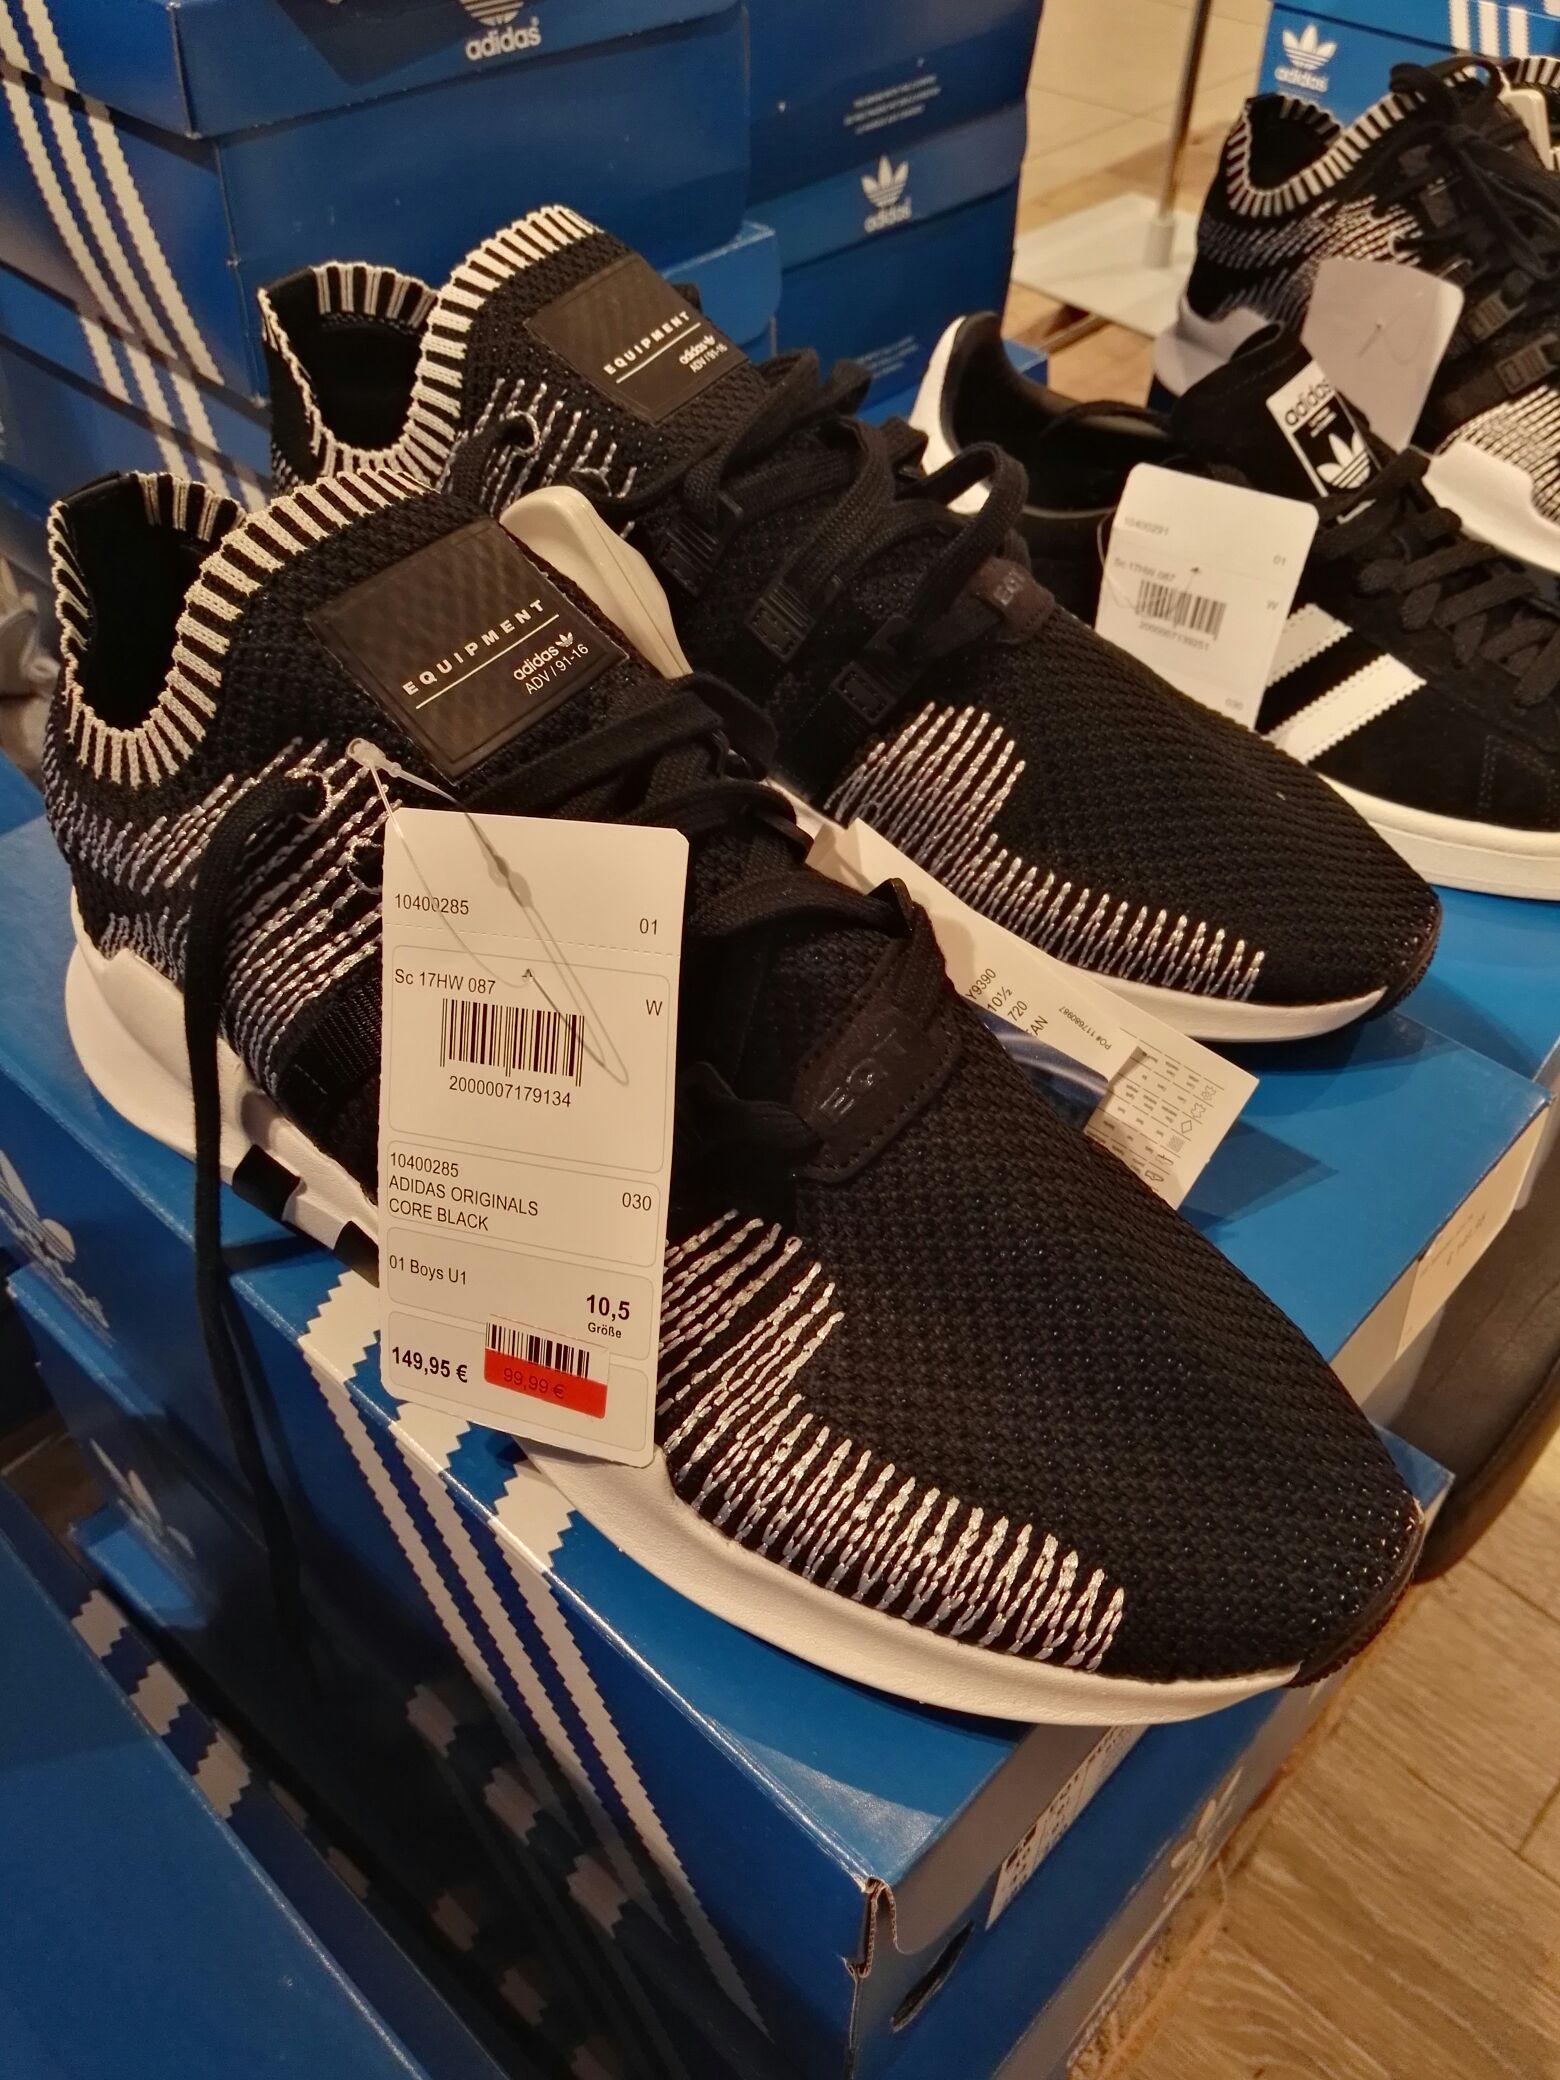 *LOKAL Ingolstadt* Adidas Originals EQT Sneaker black white